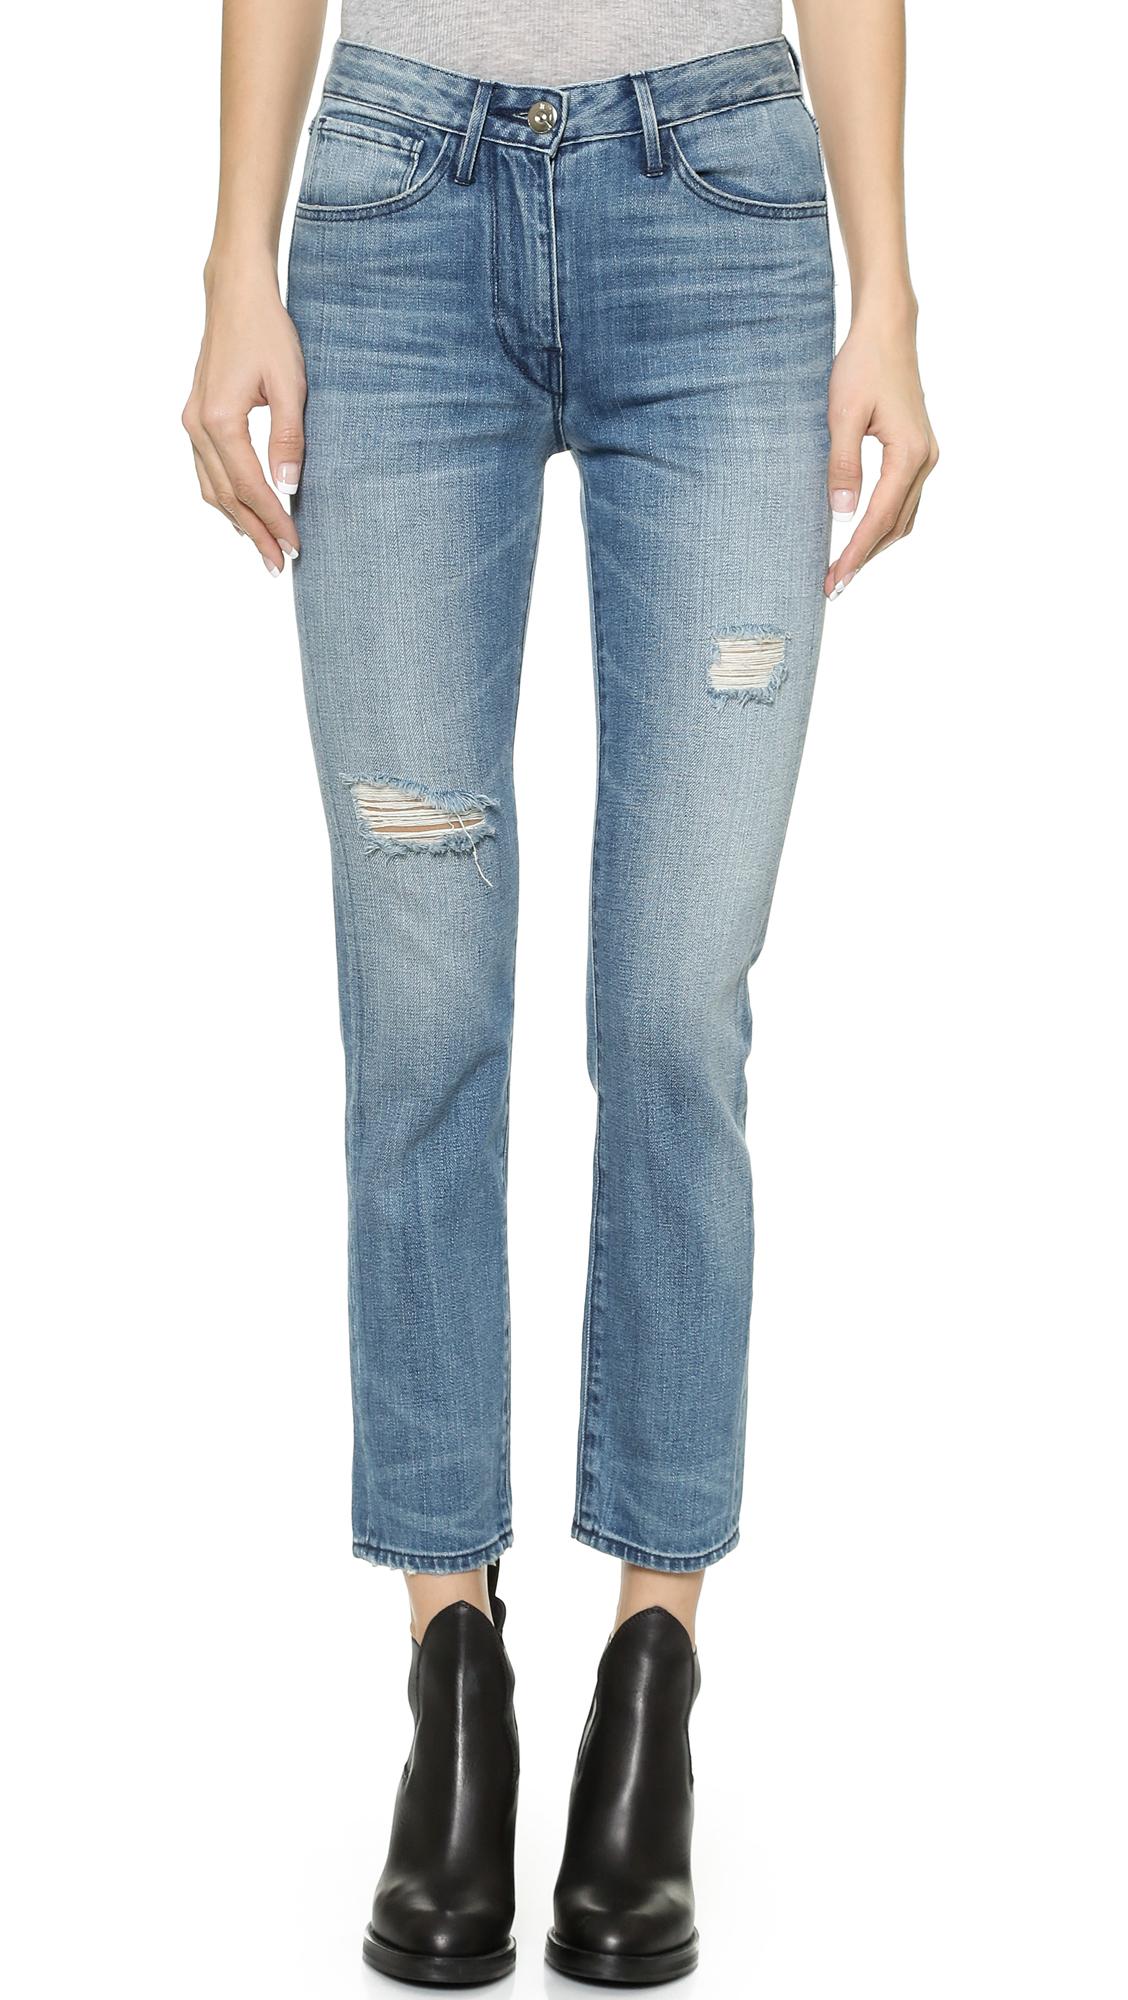 5b1de94c15c6f3 3X1 W3 High Rise Straight Leg Cropped Jeans - Mcqueen in Blue - Lyst